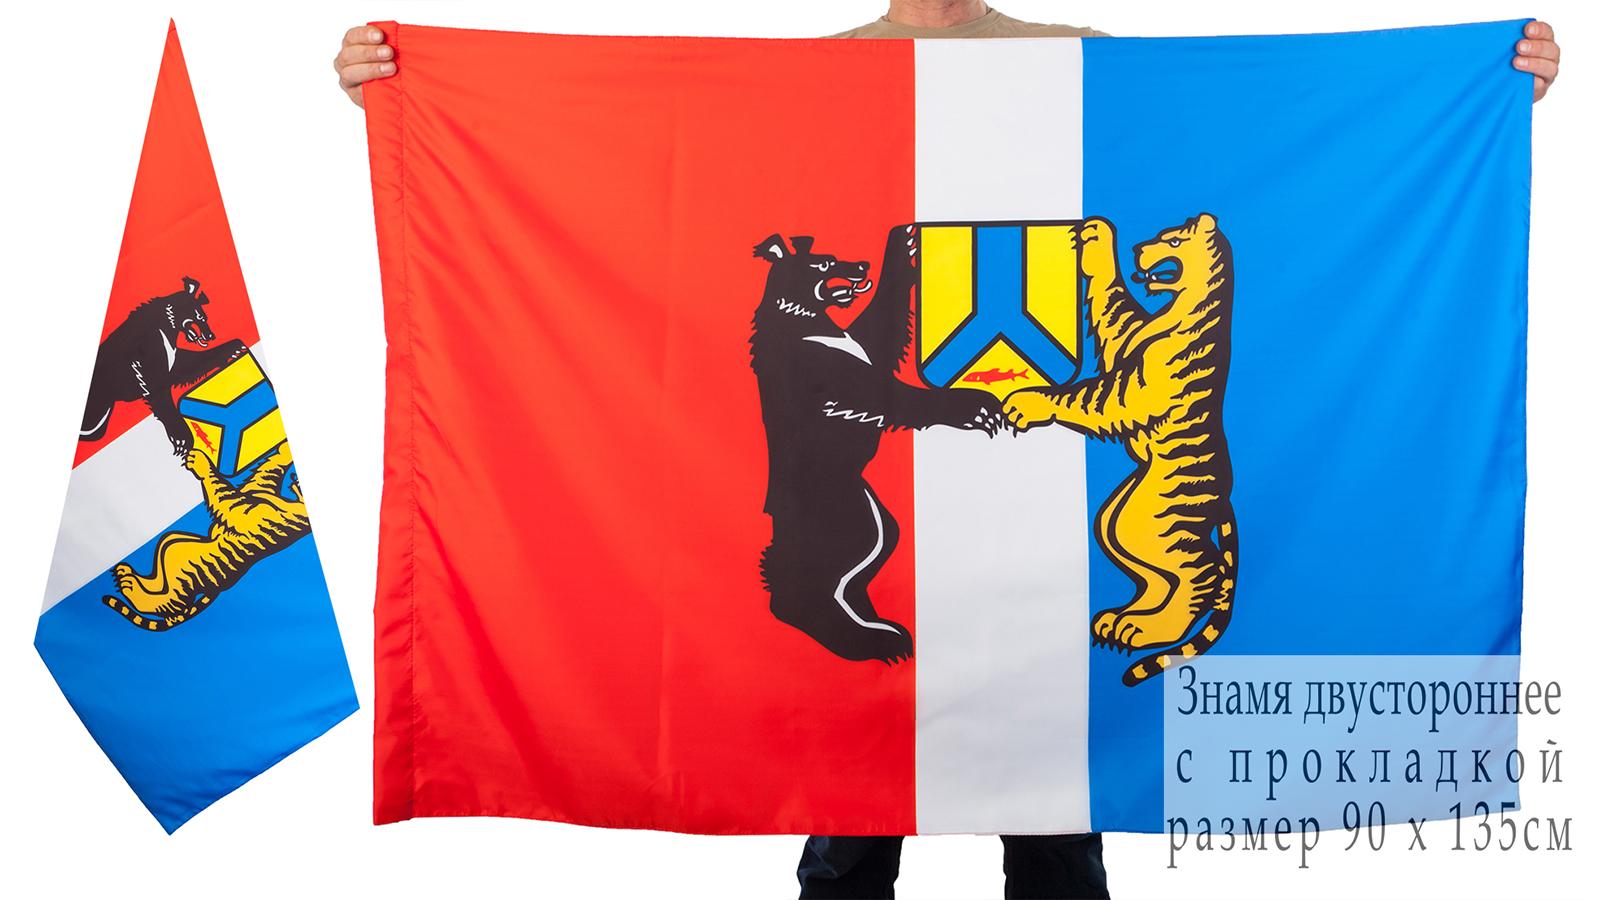 Двухсторонний флаг Хабаровска